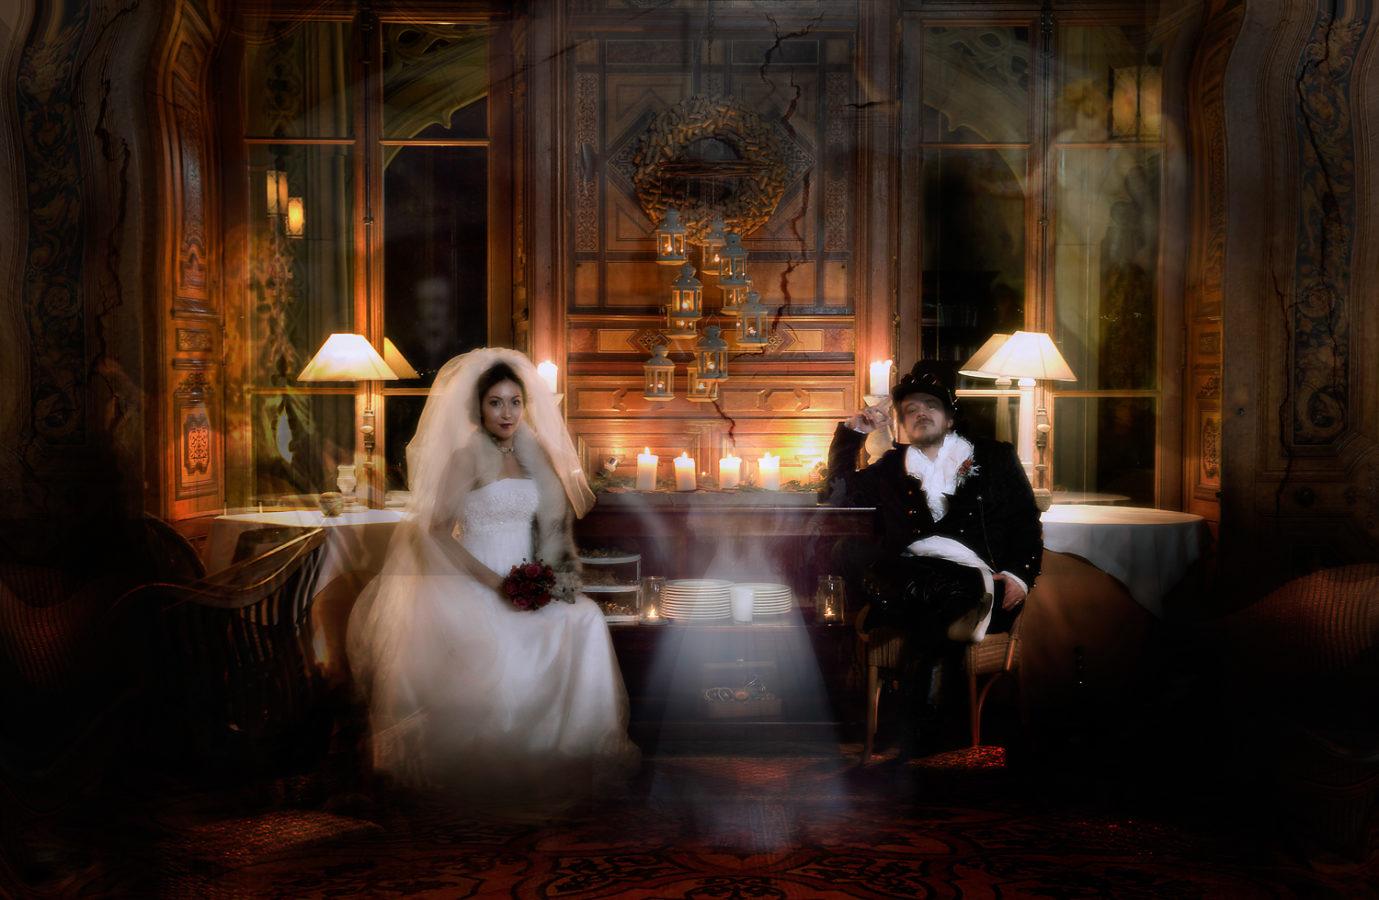 Steampunk Brautpaar Schloss Schadau Thun, Steam Punk Hochzeitsfotograf Thun, Hochzeitsfotos Steam Punk, Steam Punk Hochzeitsshooting Thun